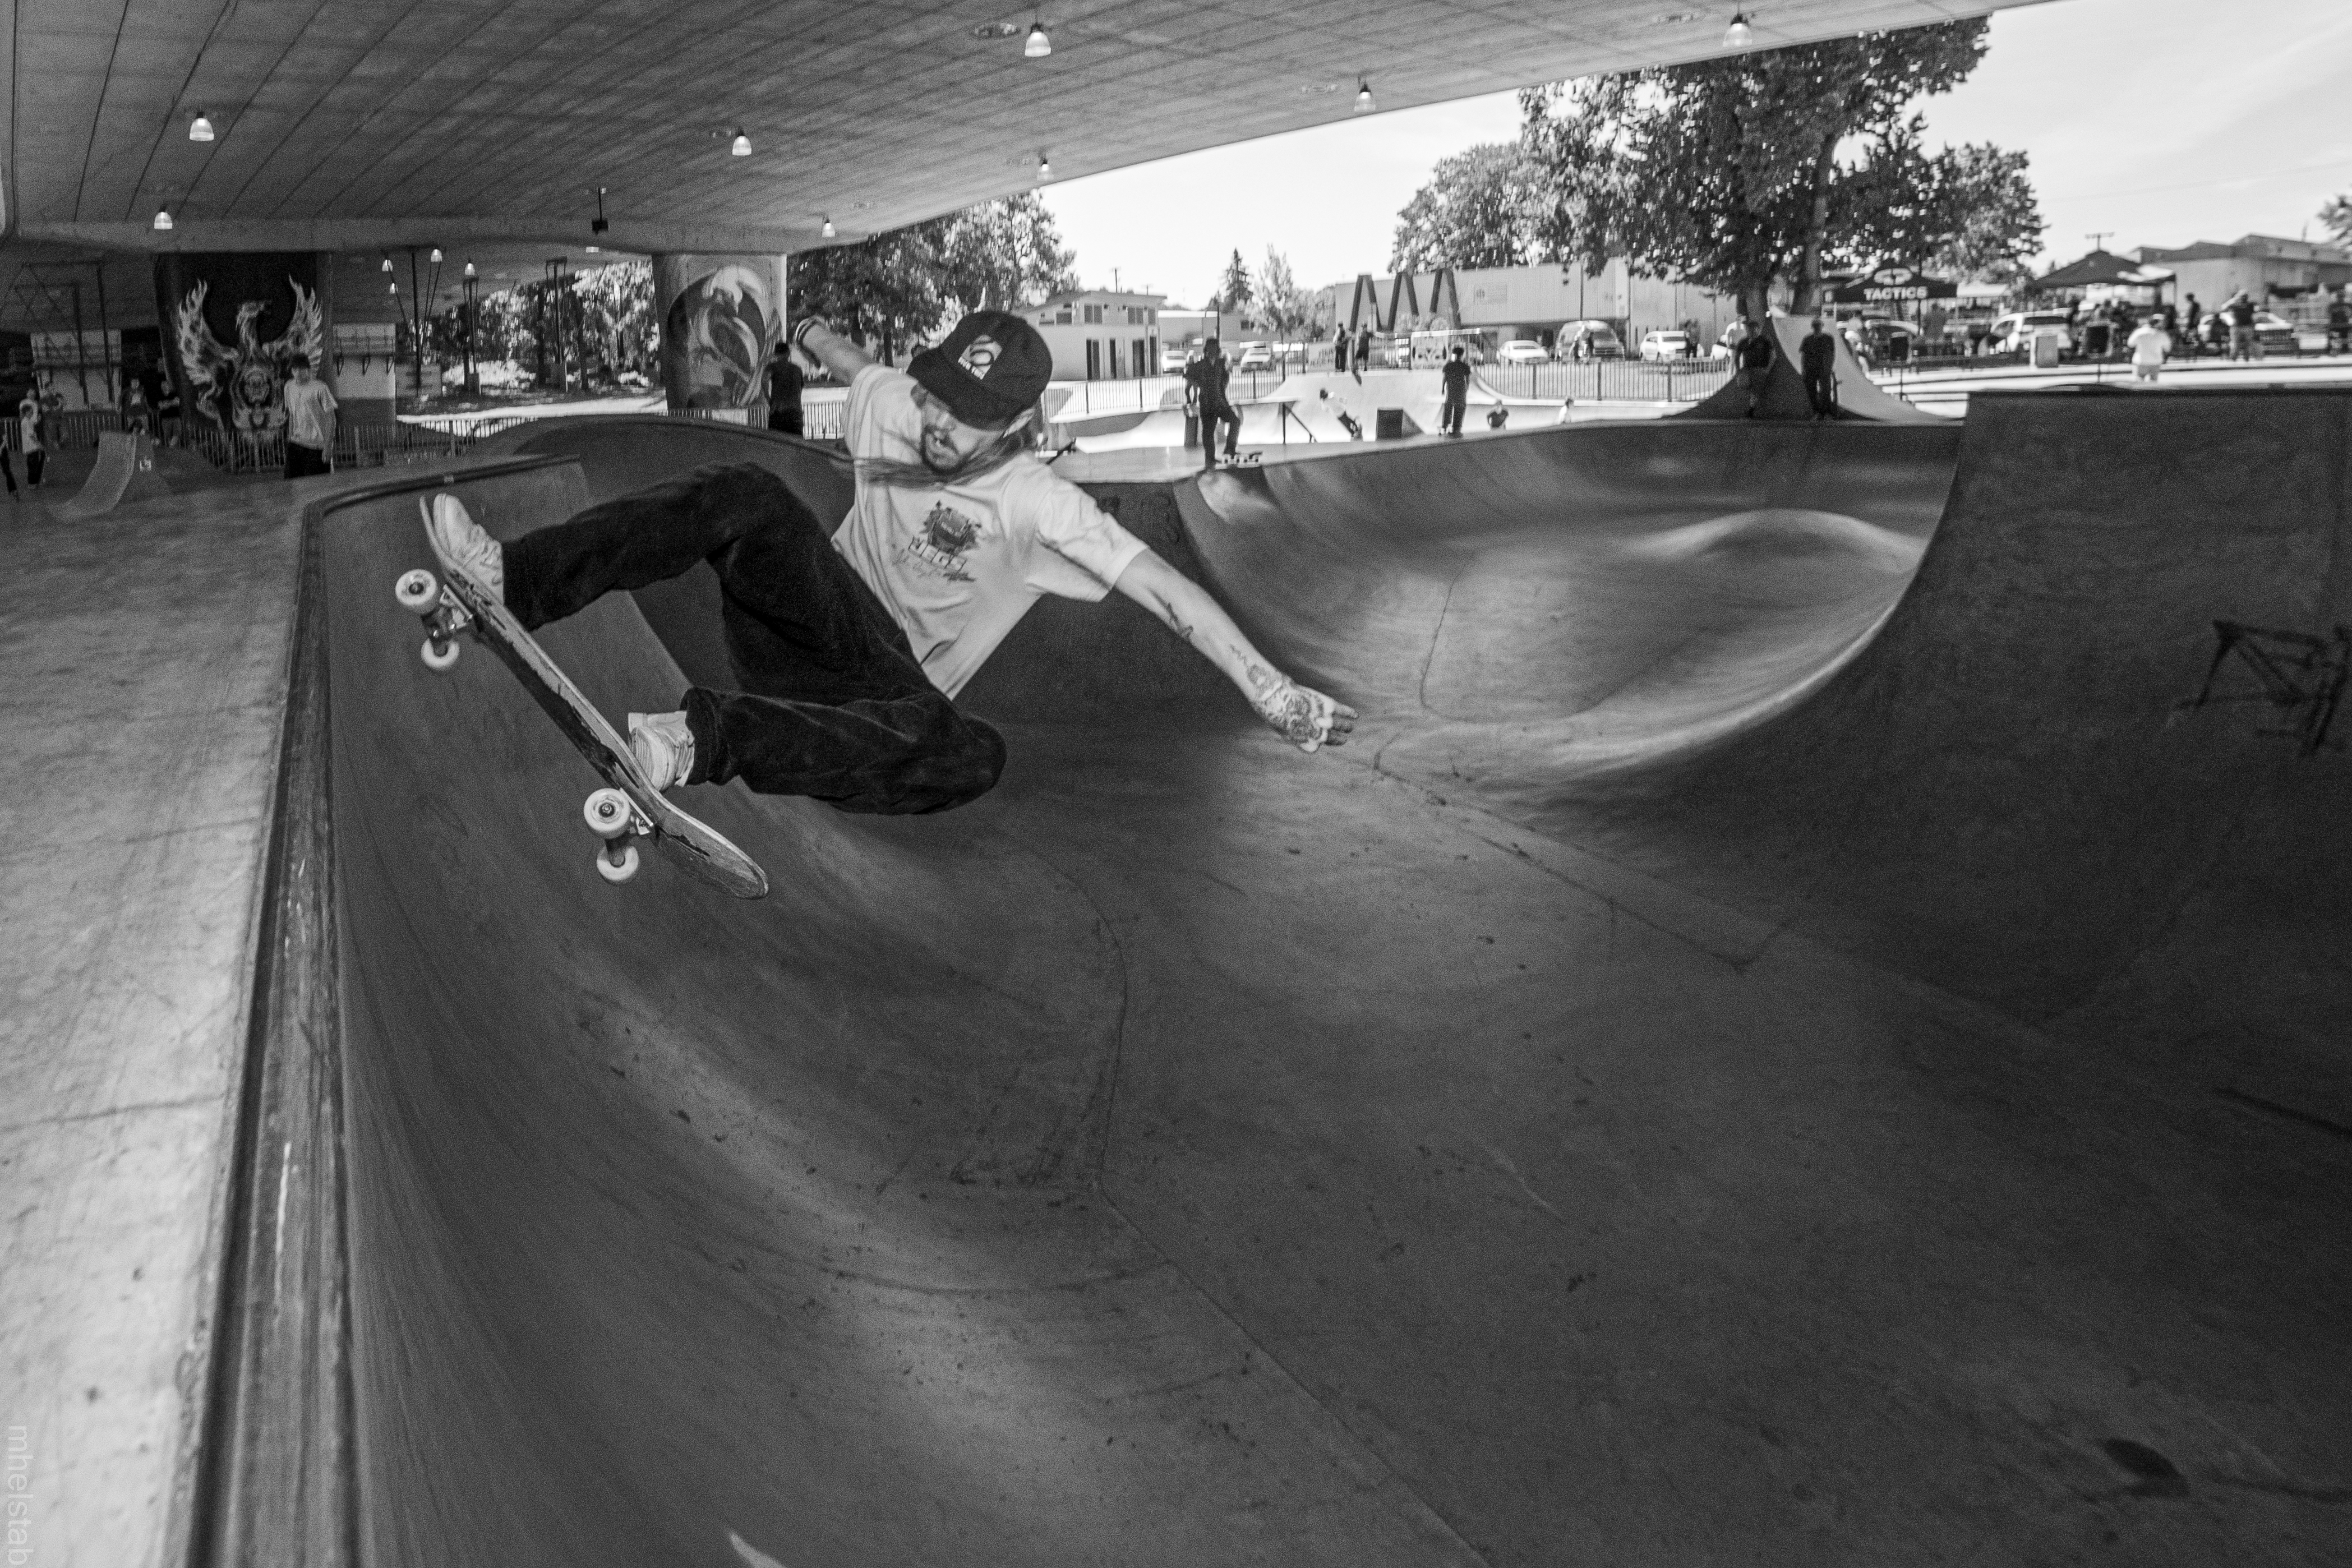 Tristan Yaroscak_Frontside Ollie